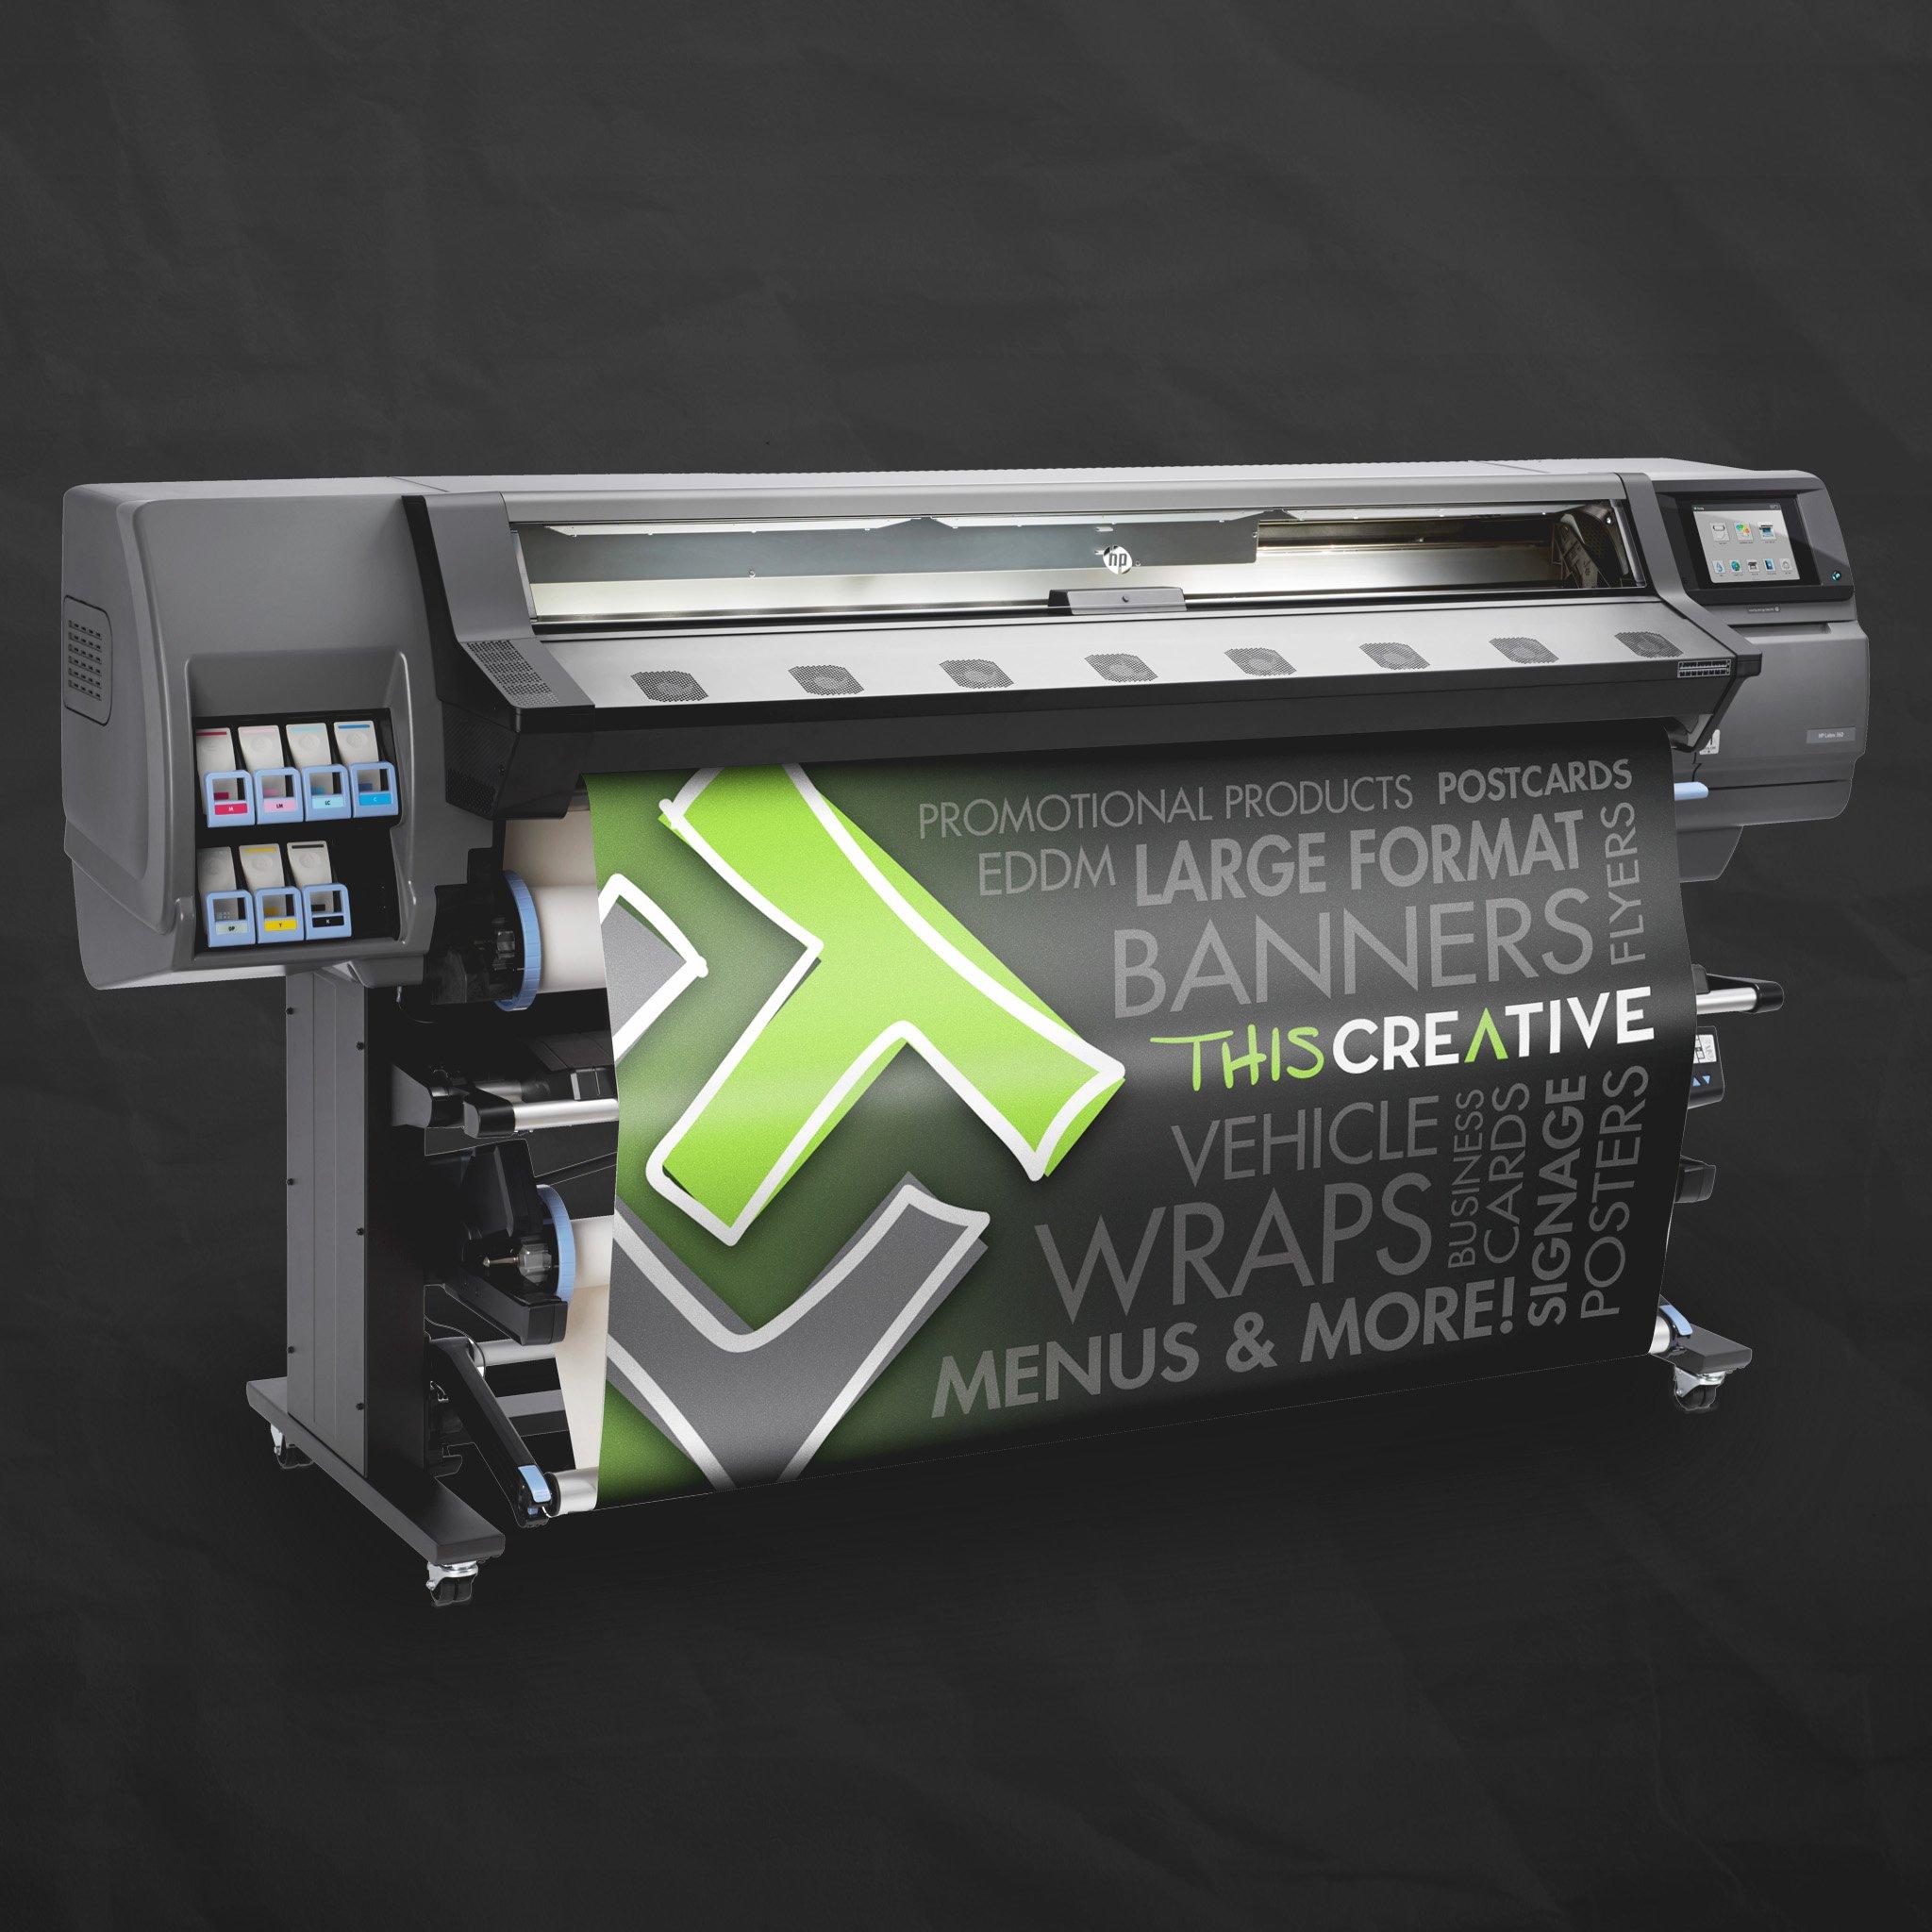 This Creative Banner Printer 2394371010